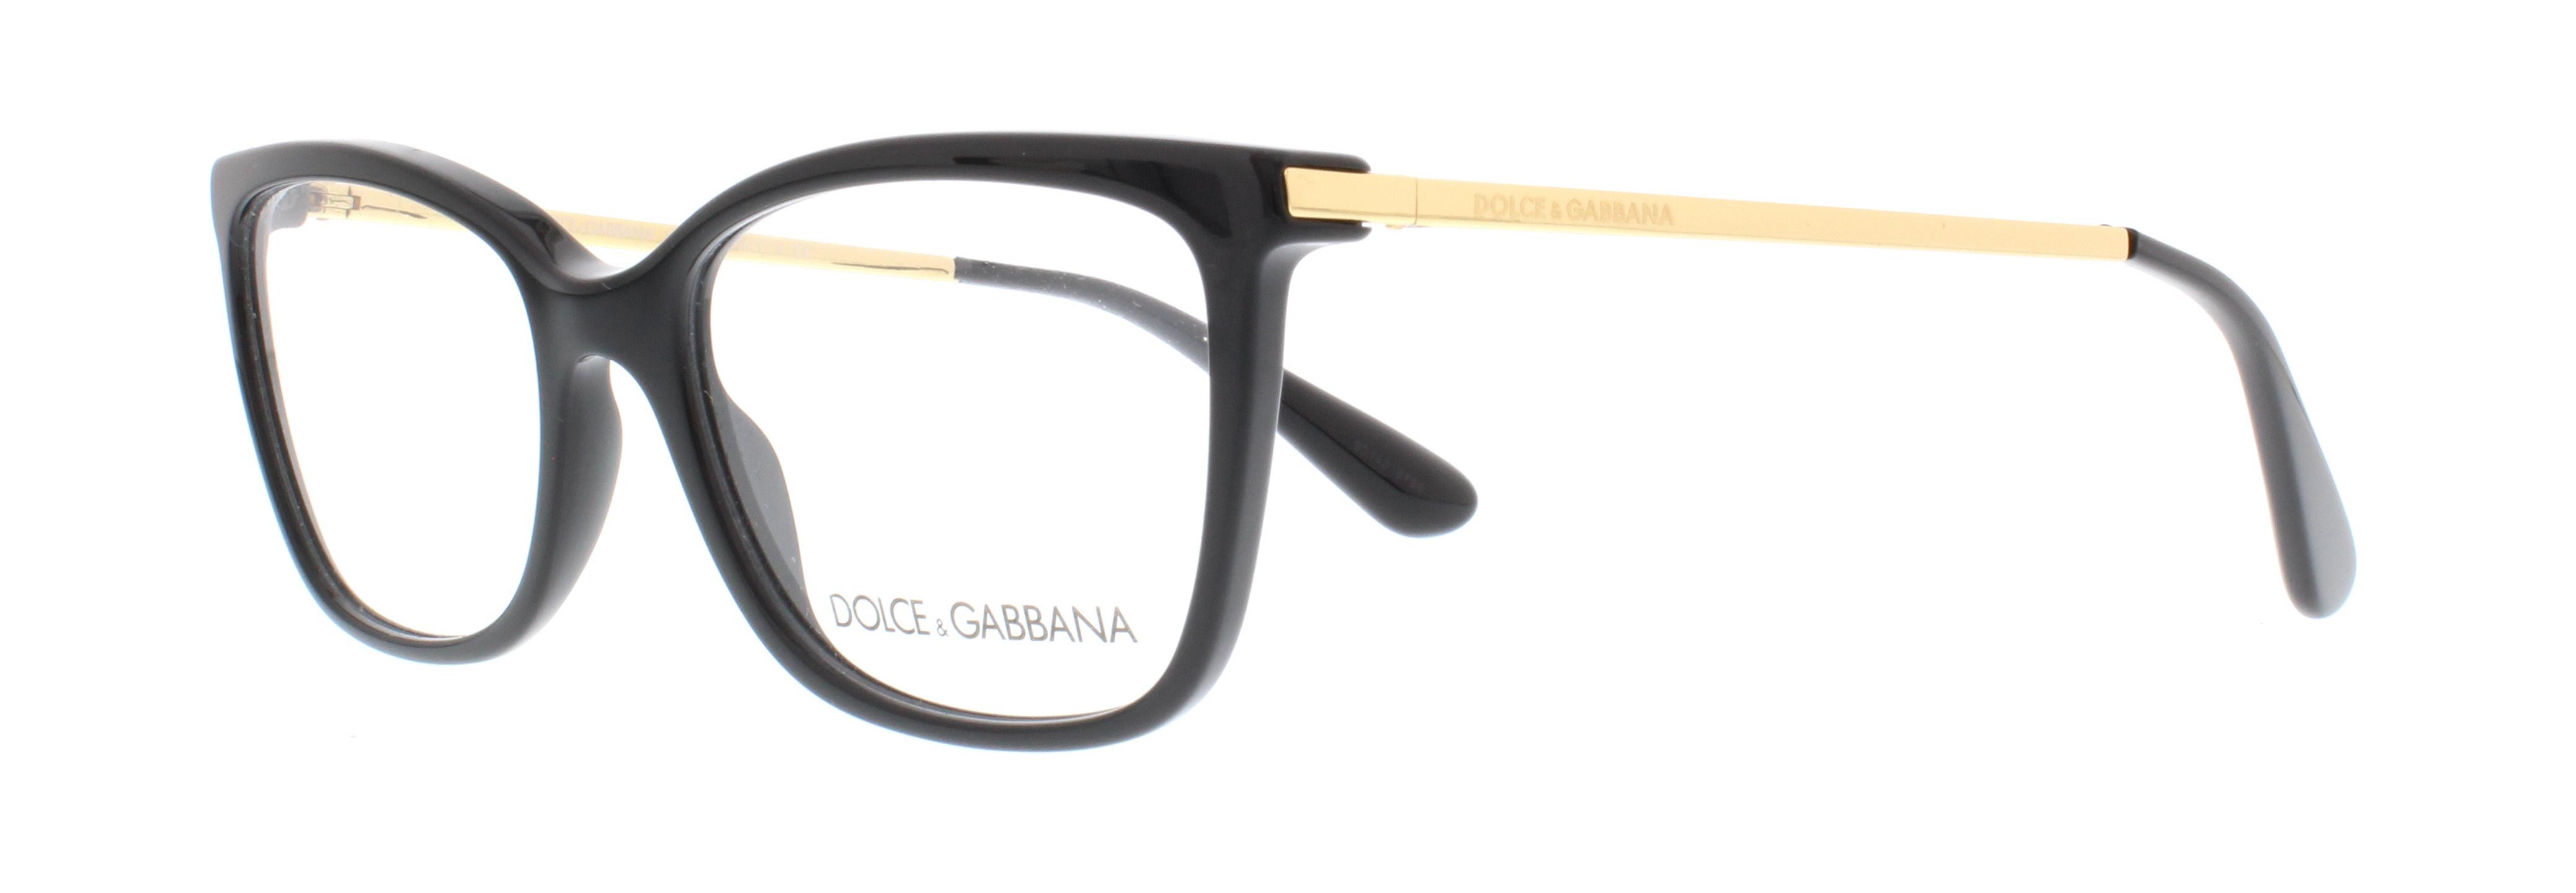 501 black - Dolce And Gabbana Glasses Frames